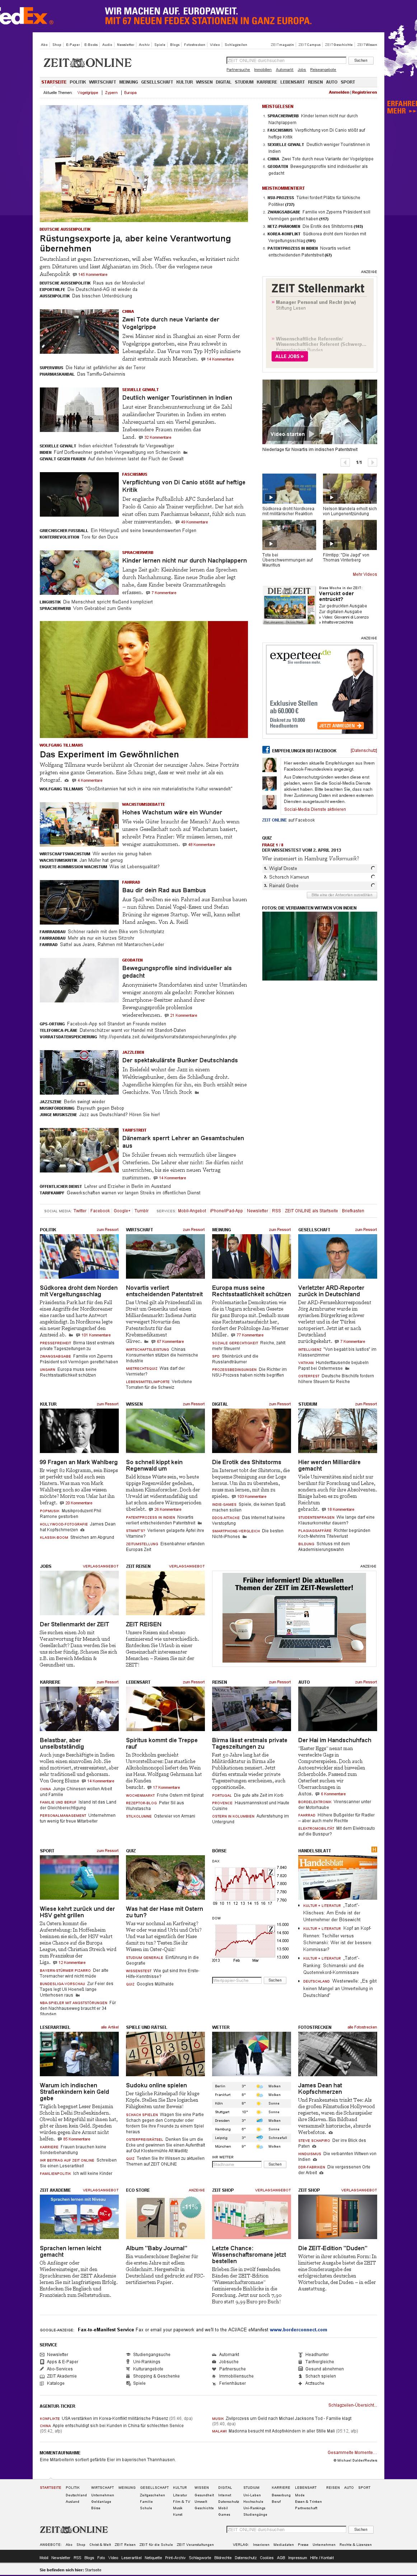 Zeit Online at Tuesday April 2, 2013, 4:28 a.m. UTC